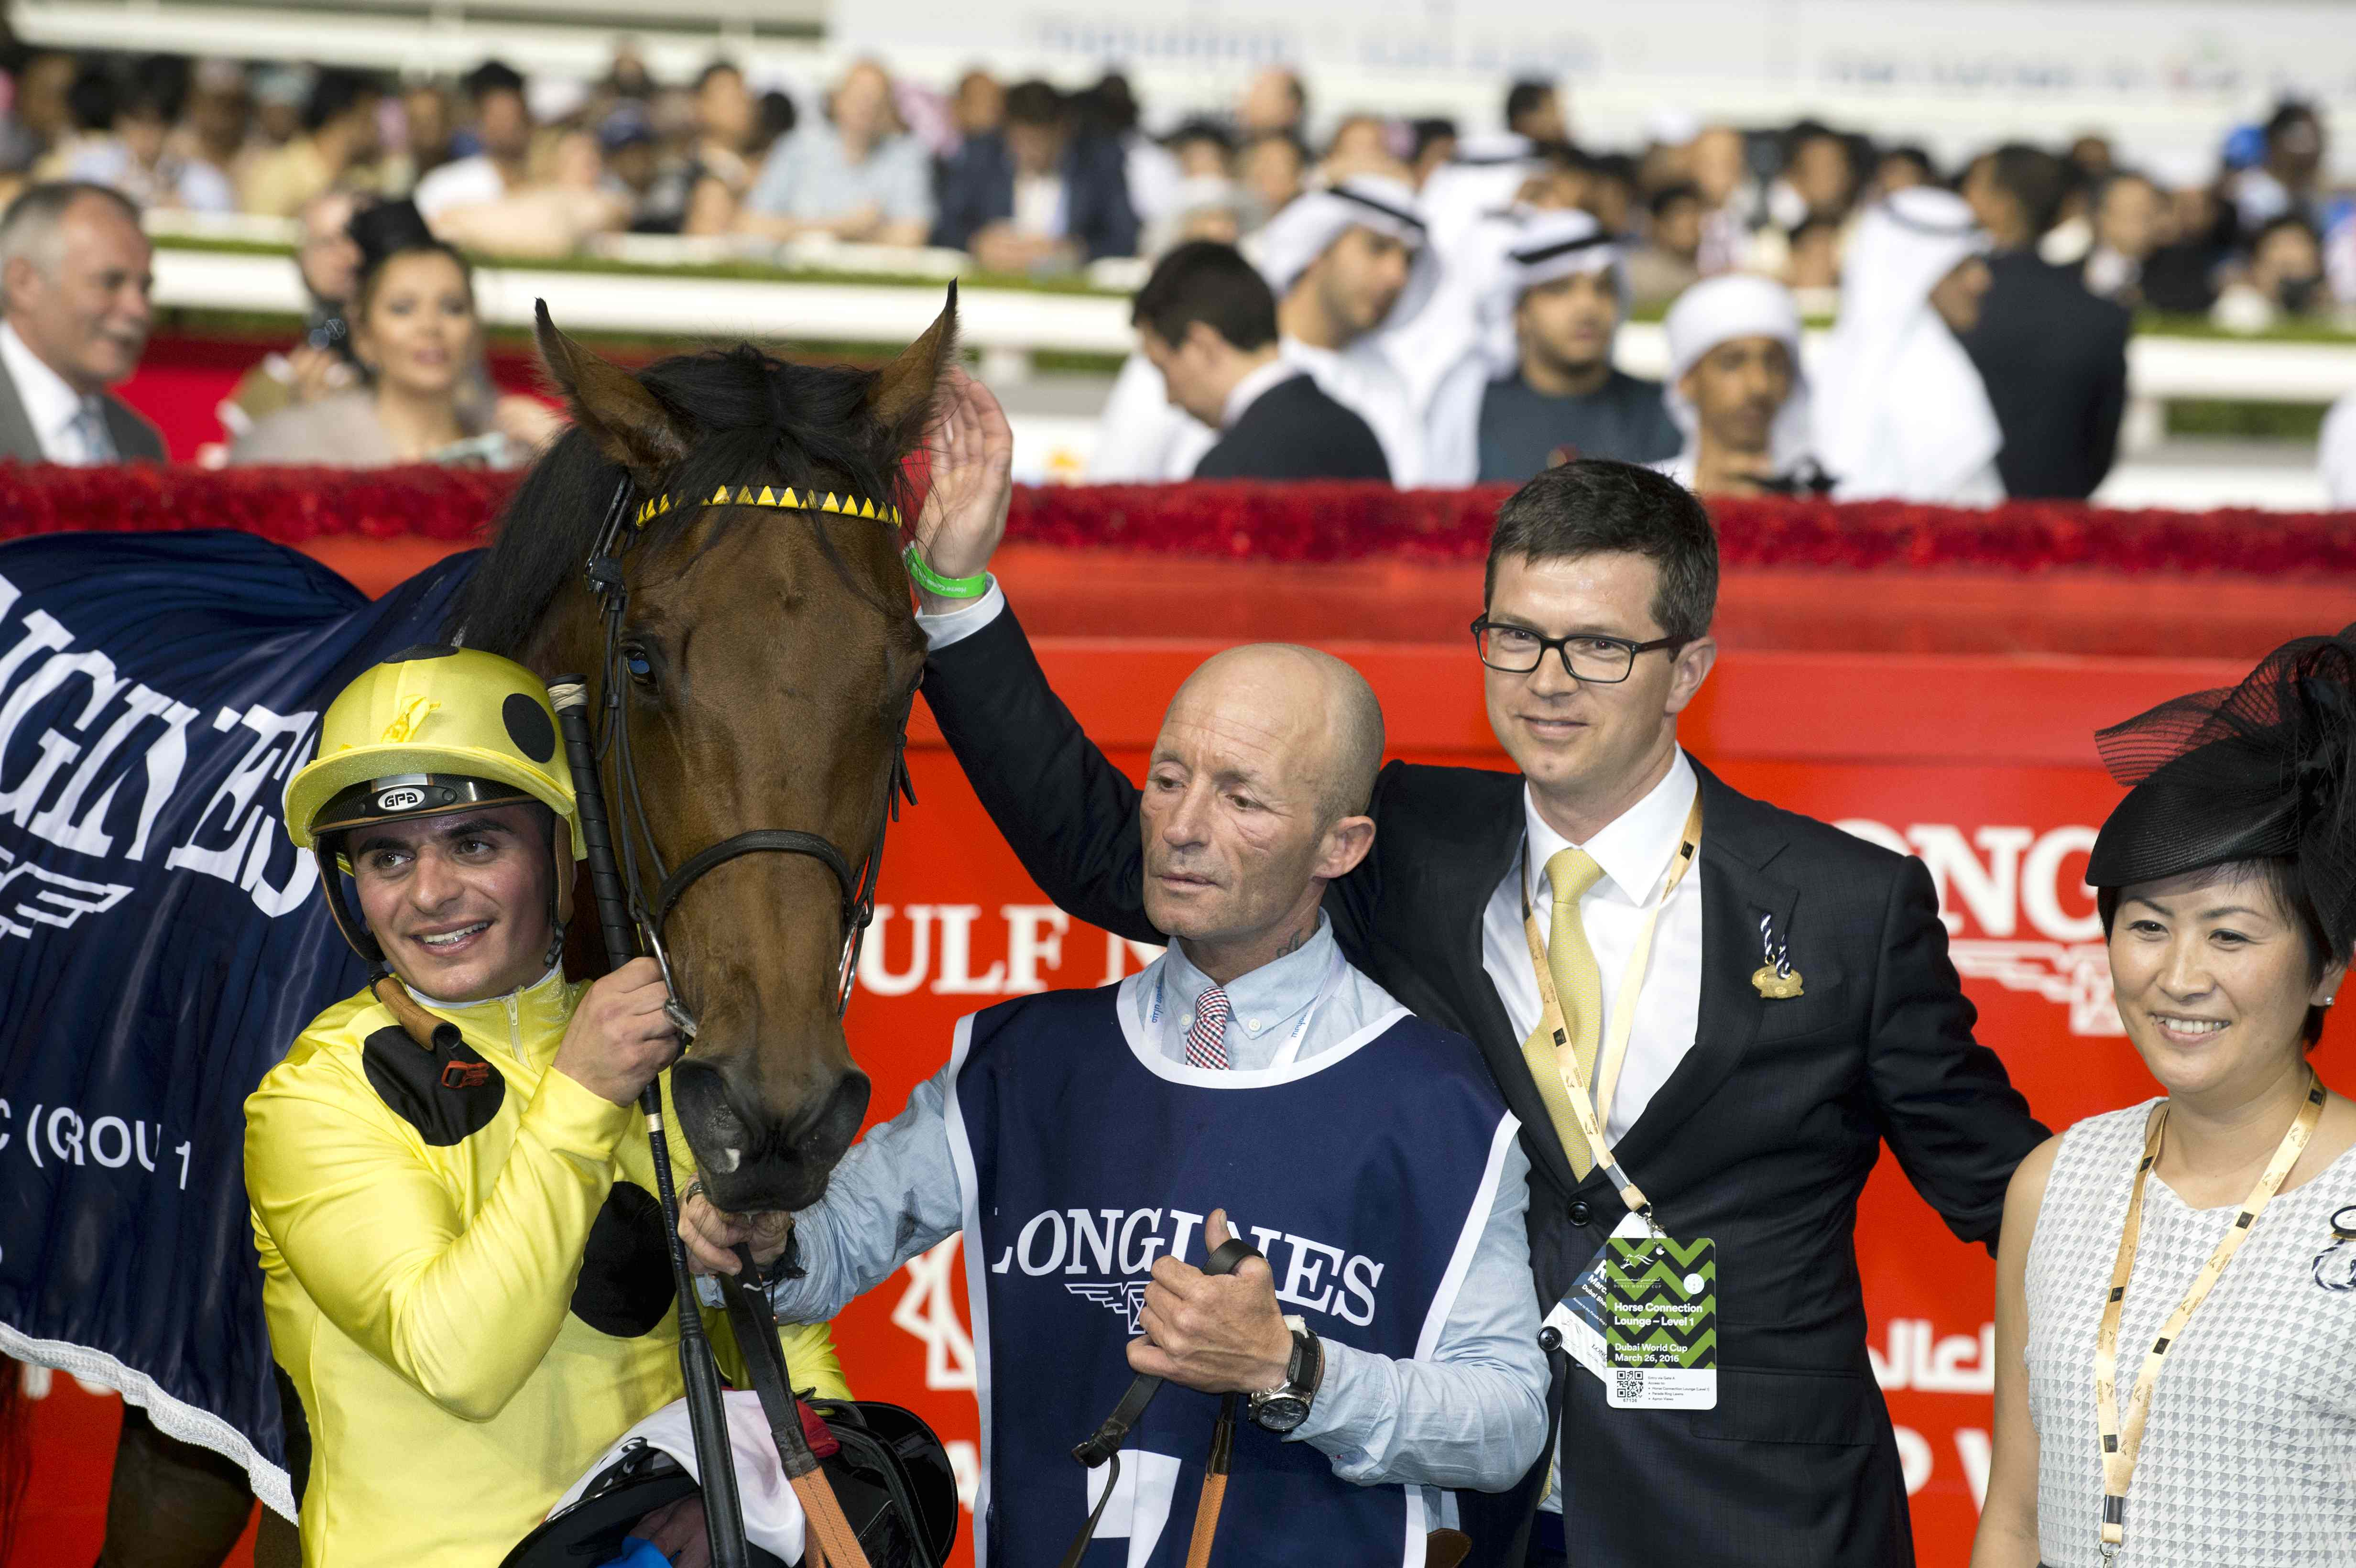 Roger Varian and wife Hanako celebrate Dubai Sheema Classic success with Postponed and jockey Andrea Atzeni